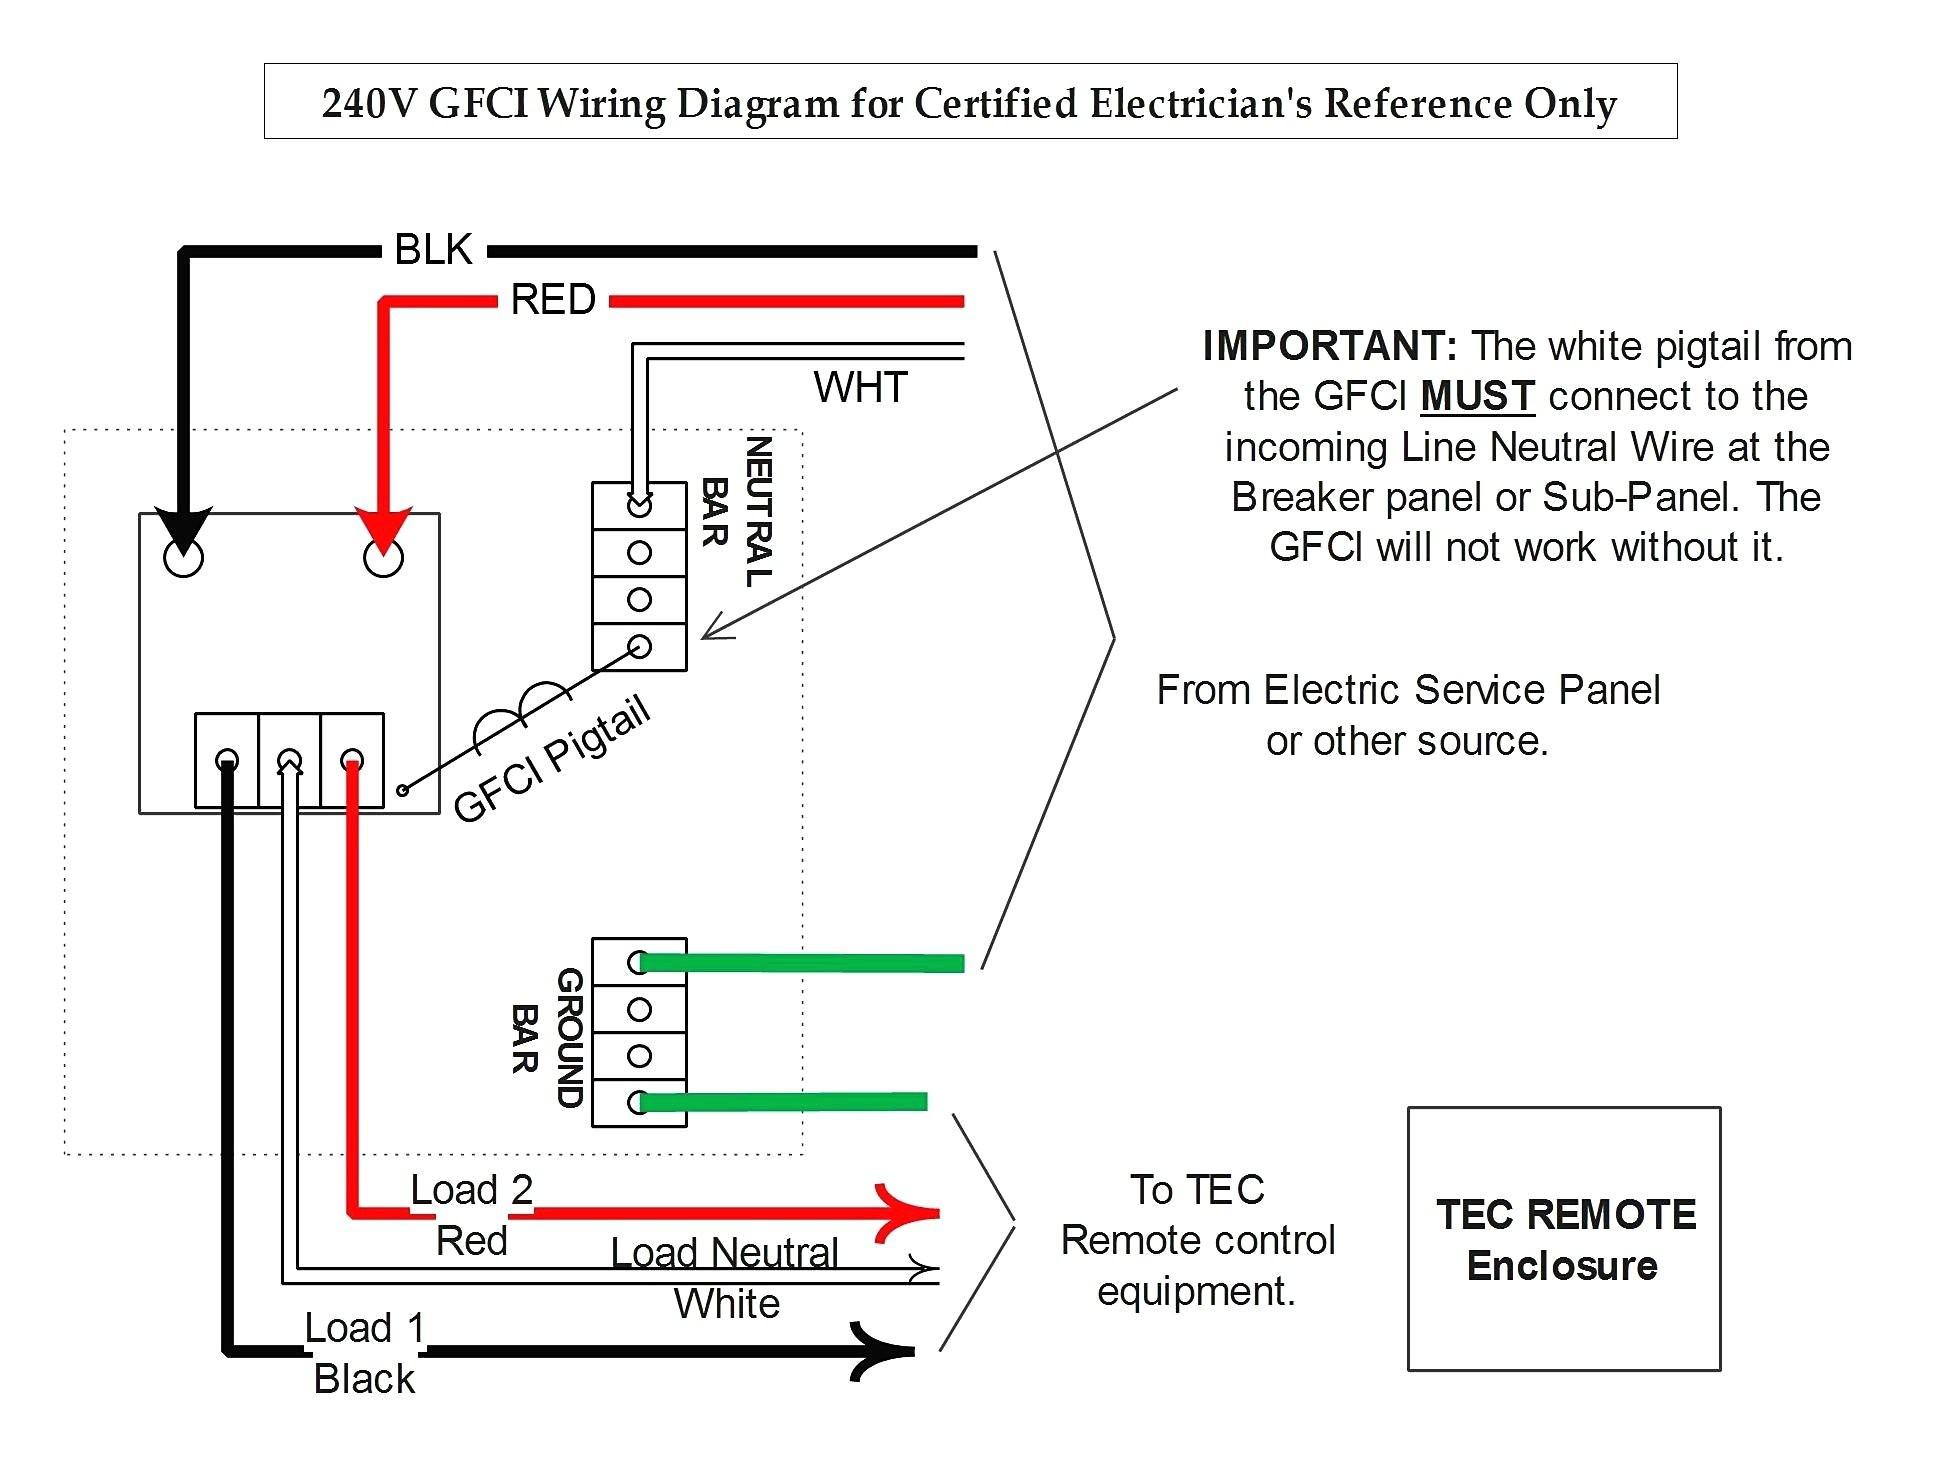 gfci wiring diagram feed through method to gfci wiring GFCI Plug Wiring Diagram gfci wiring diagram feed through method to gfci wiring diagram feed through method wiring of gfci wiring diagram feed through method